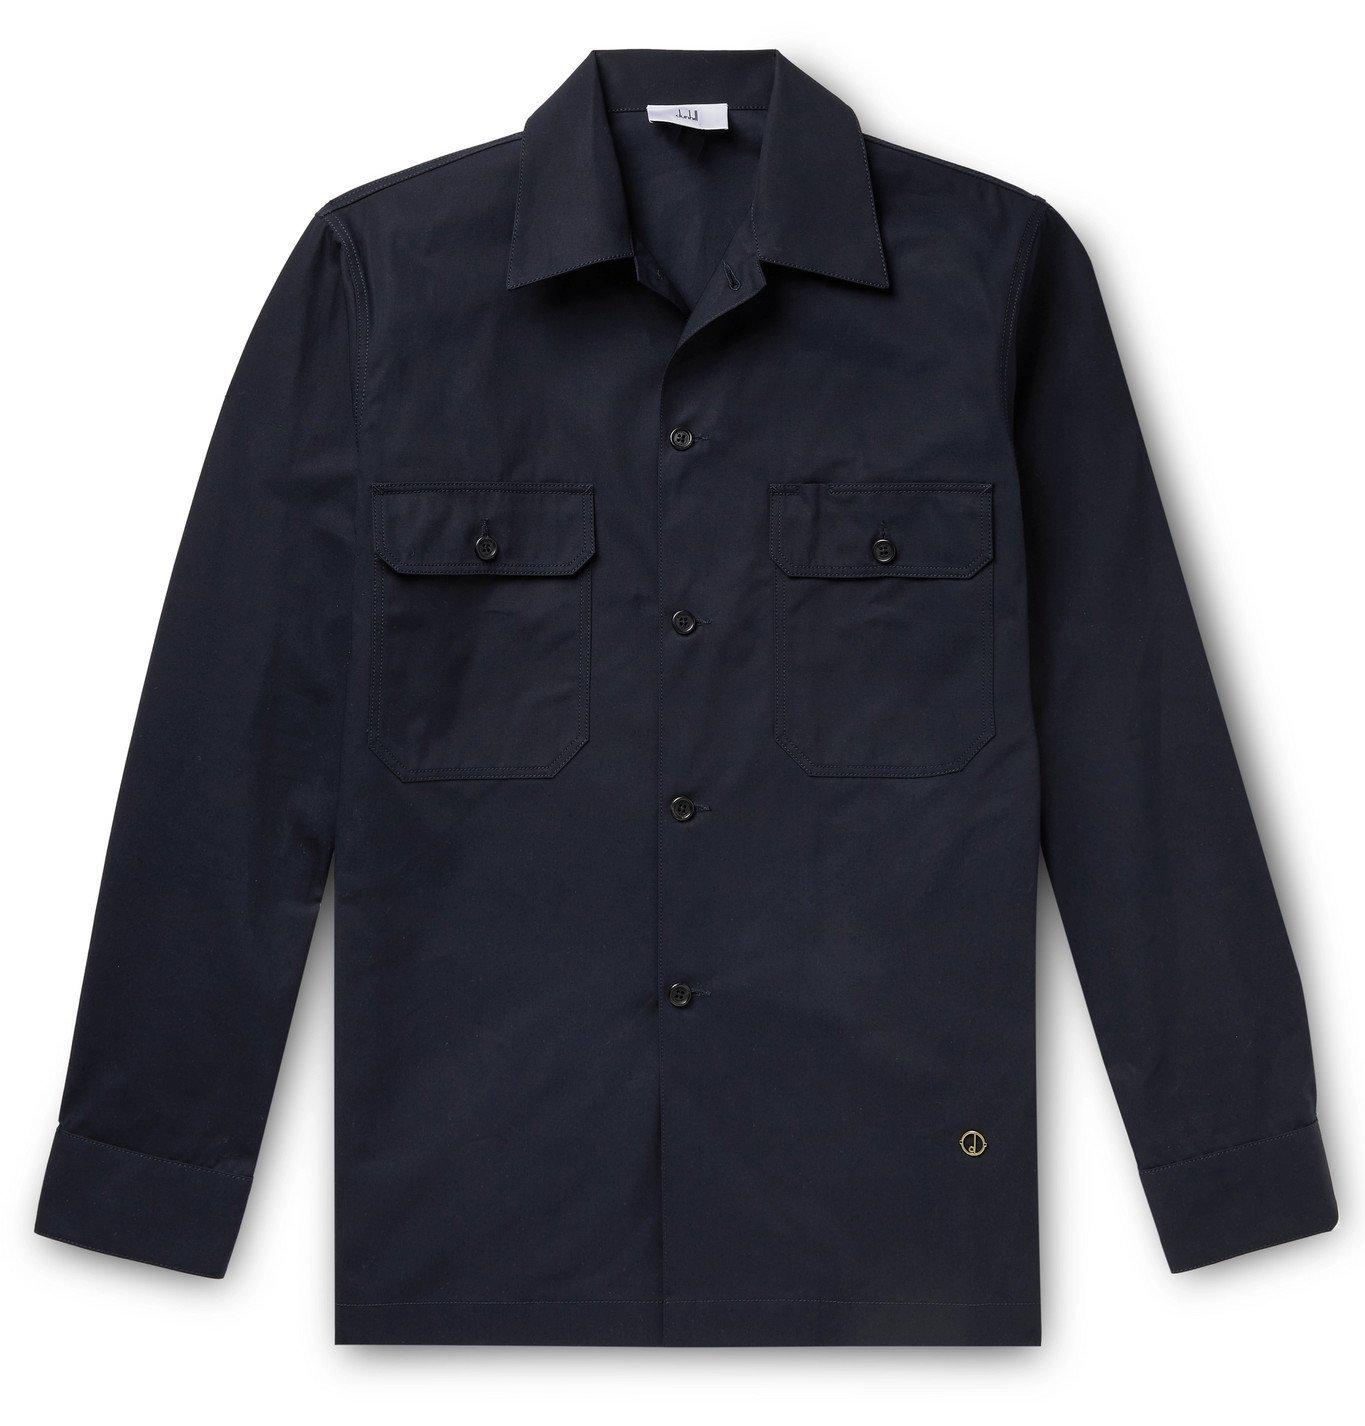 DUNHILL - Cotton-Twill Overshirt - Blue